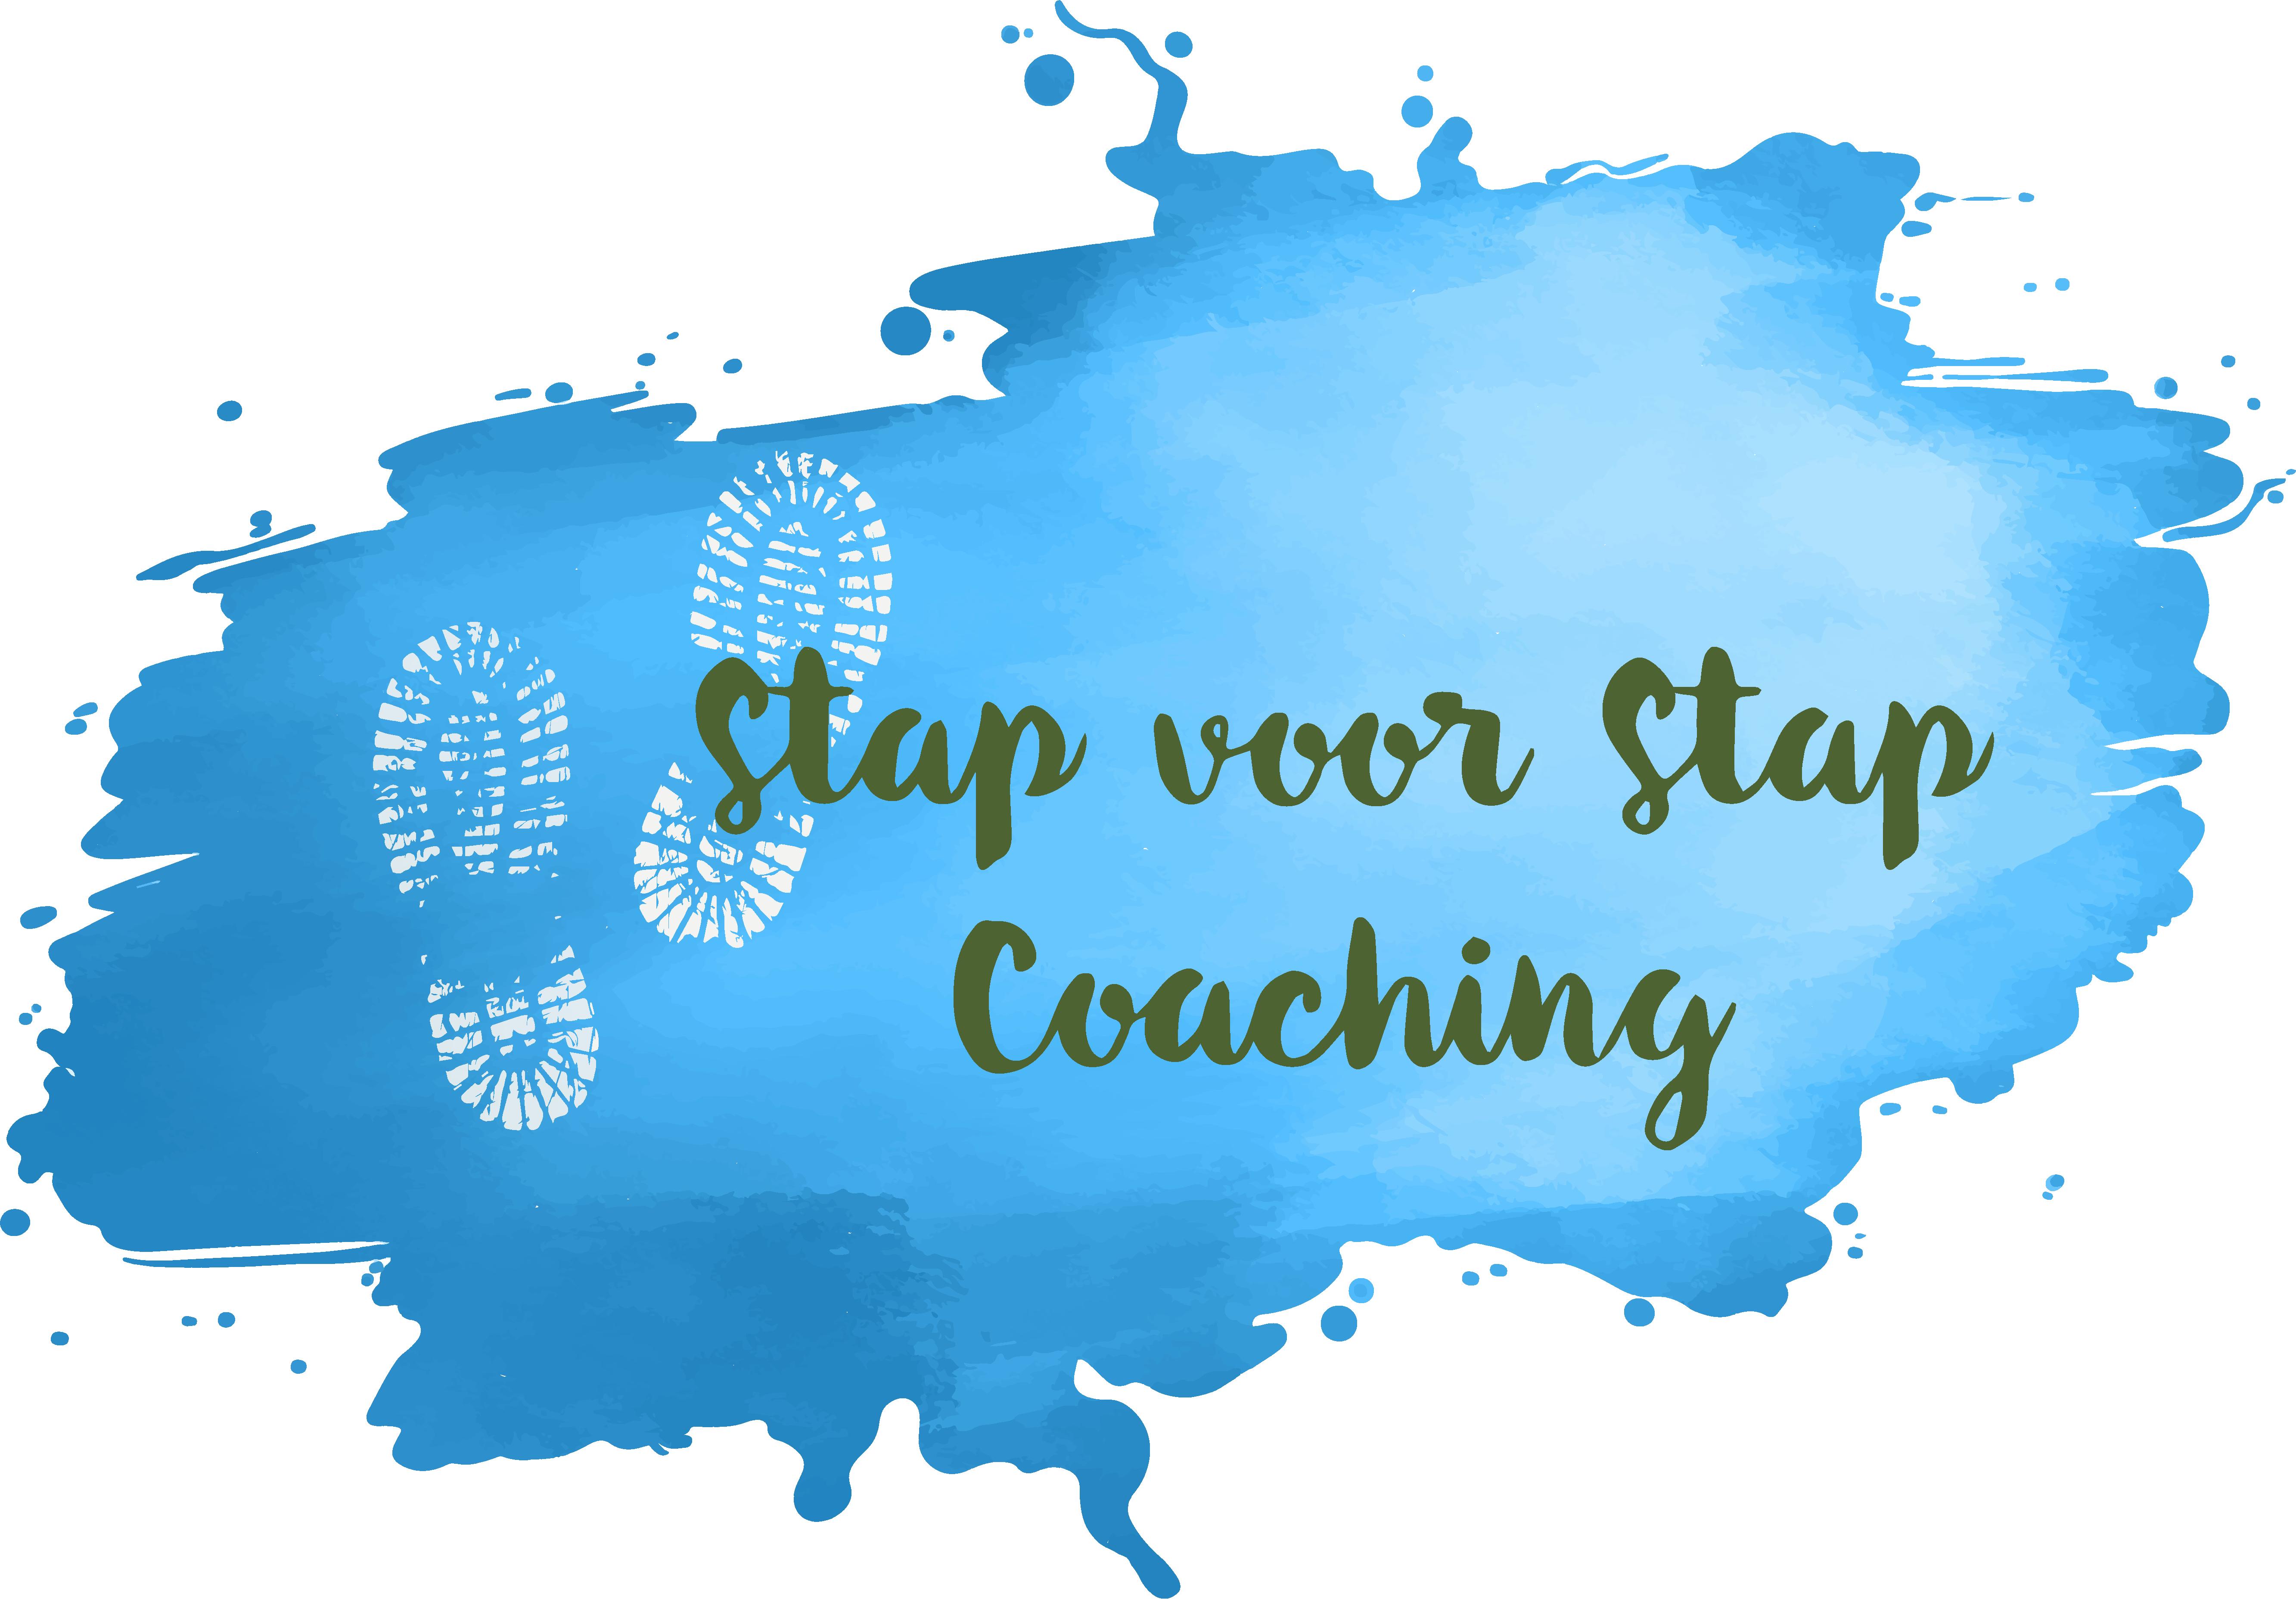 stapvoorstapcoaching.com